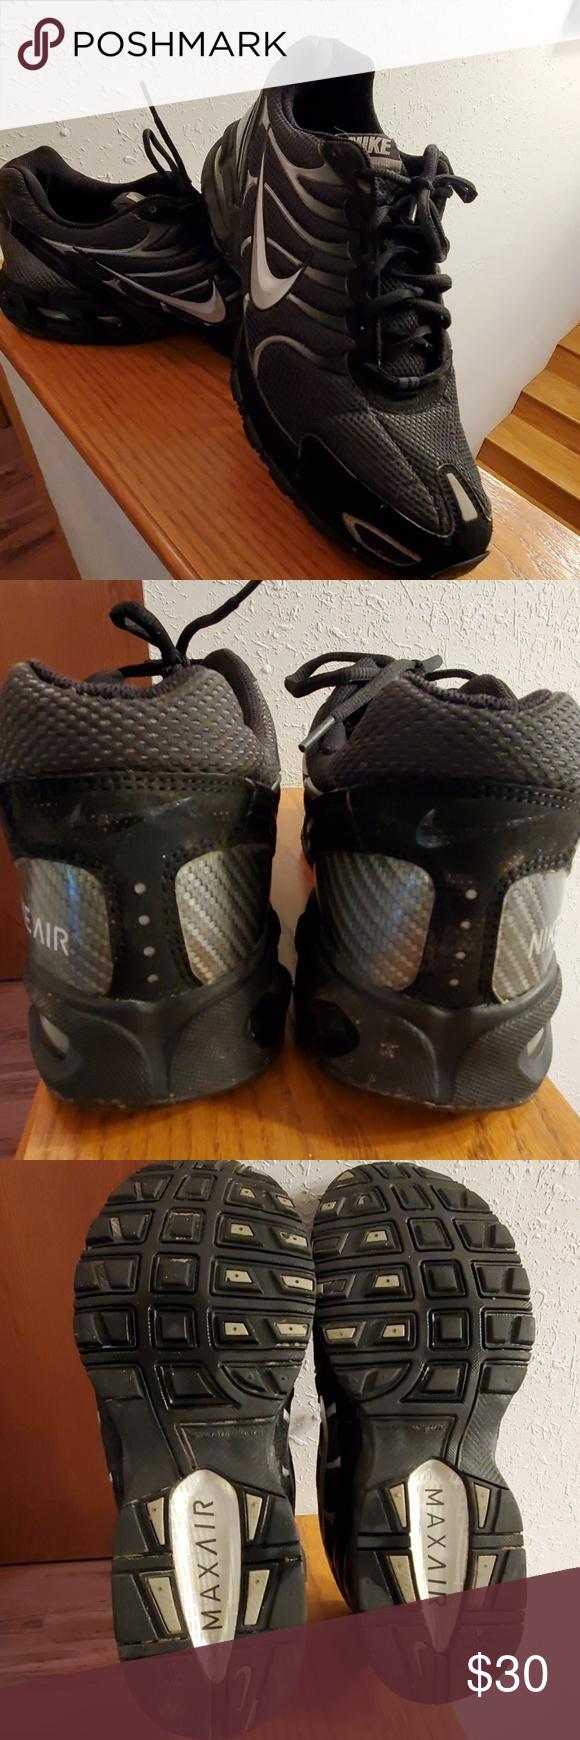 Nike Air Max Men's running shoe | Nike